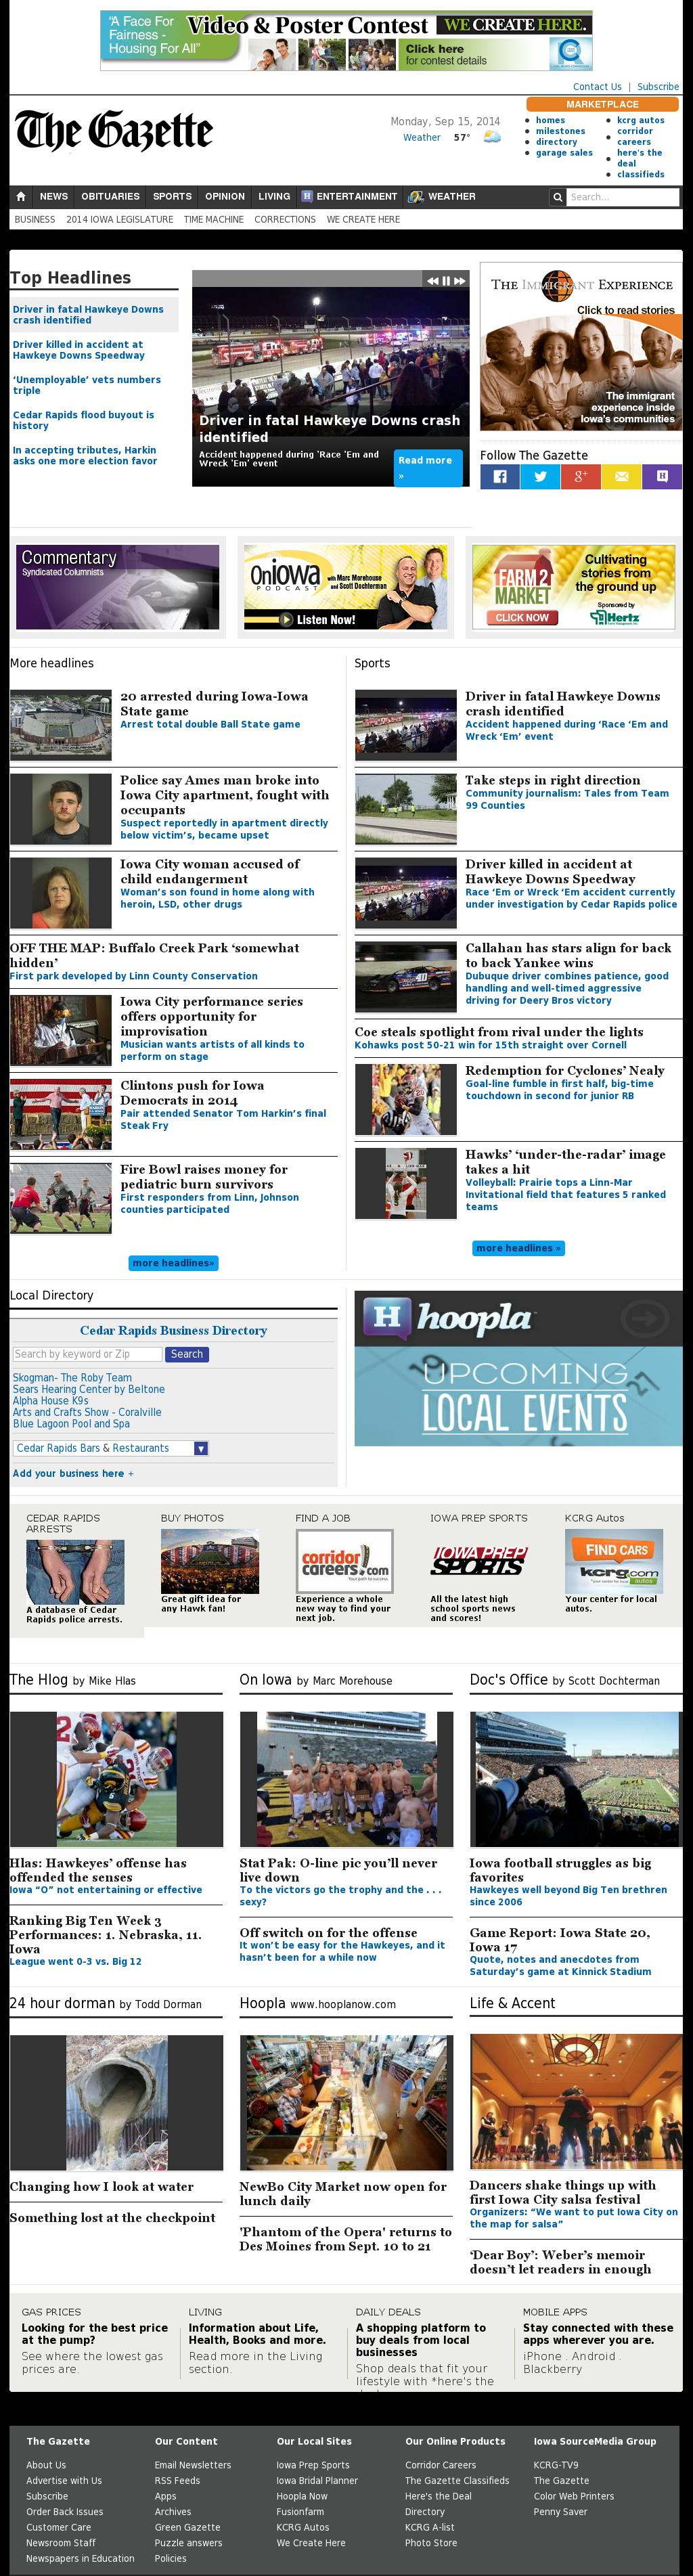 The (Cedar Rapids) Gazette at Monday Sept. 15, 2014, 3:07 p.m. UTC